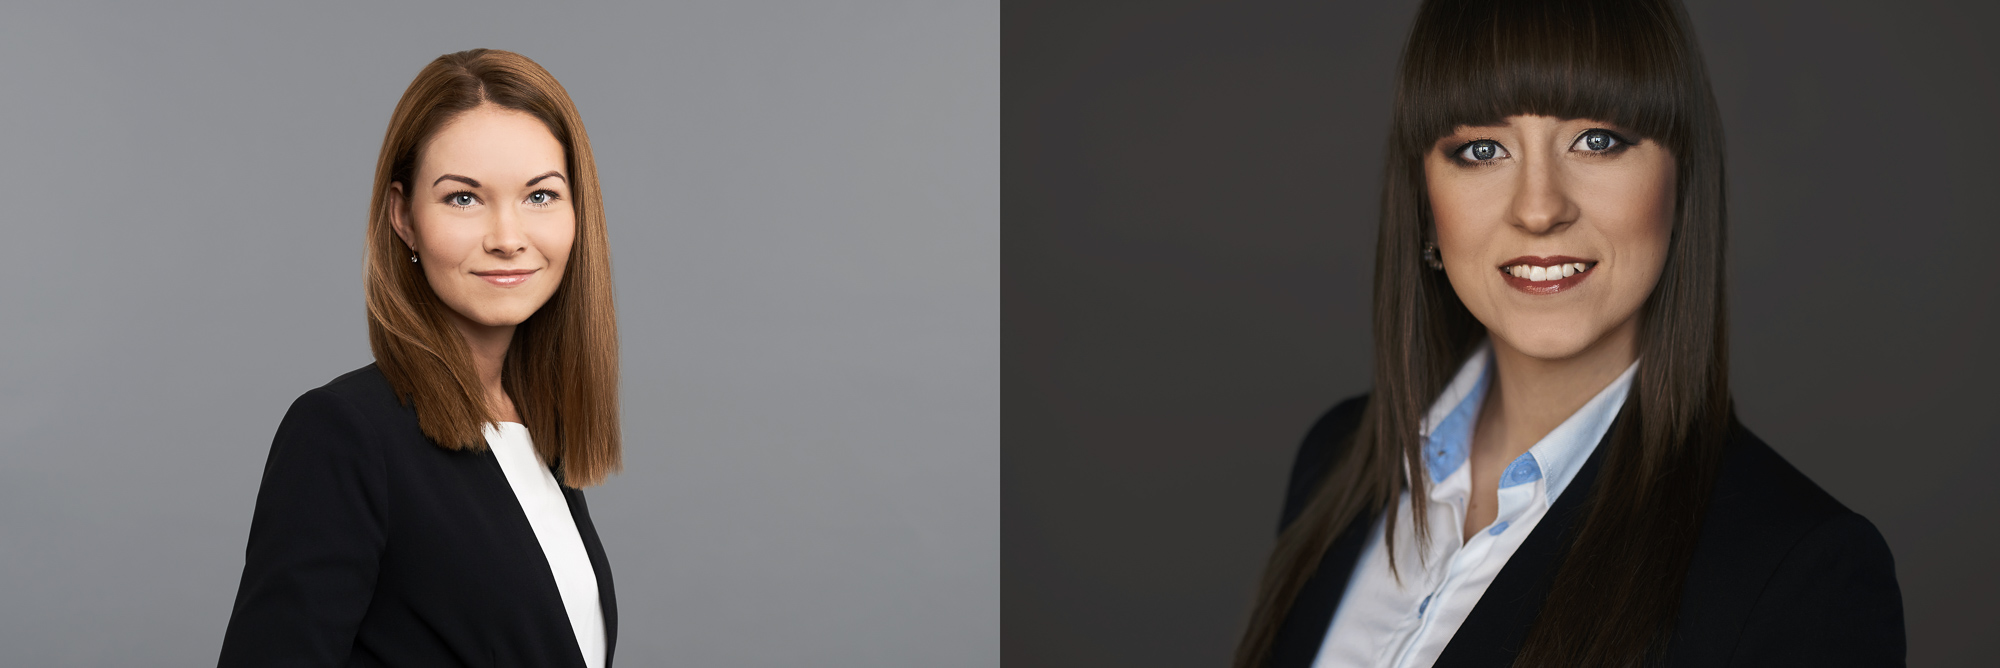 portree ametiportree fotograaf Kristian Kruuser esindusportree fotograaf tallinnas-1.jpg